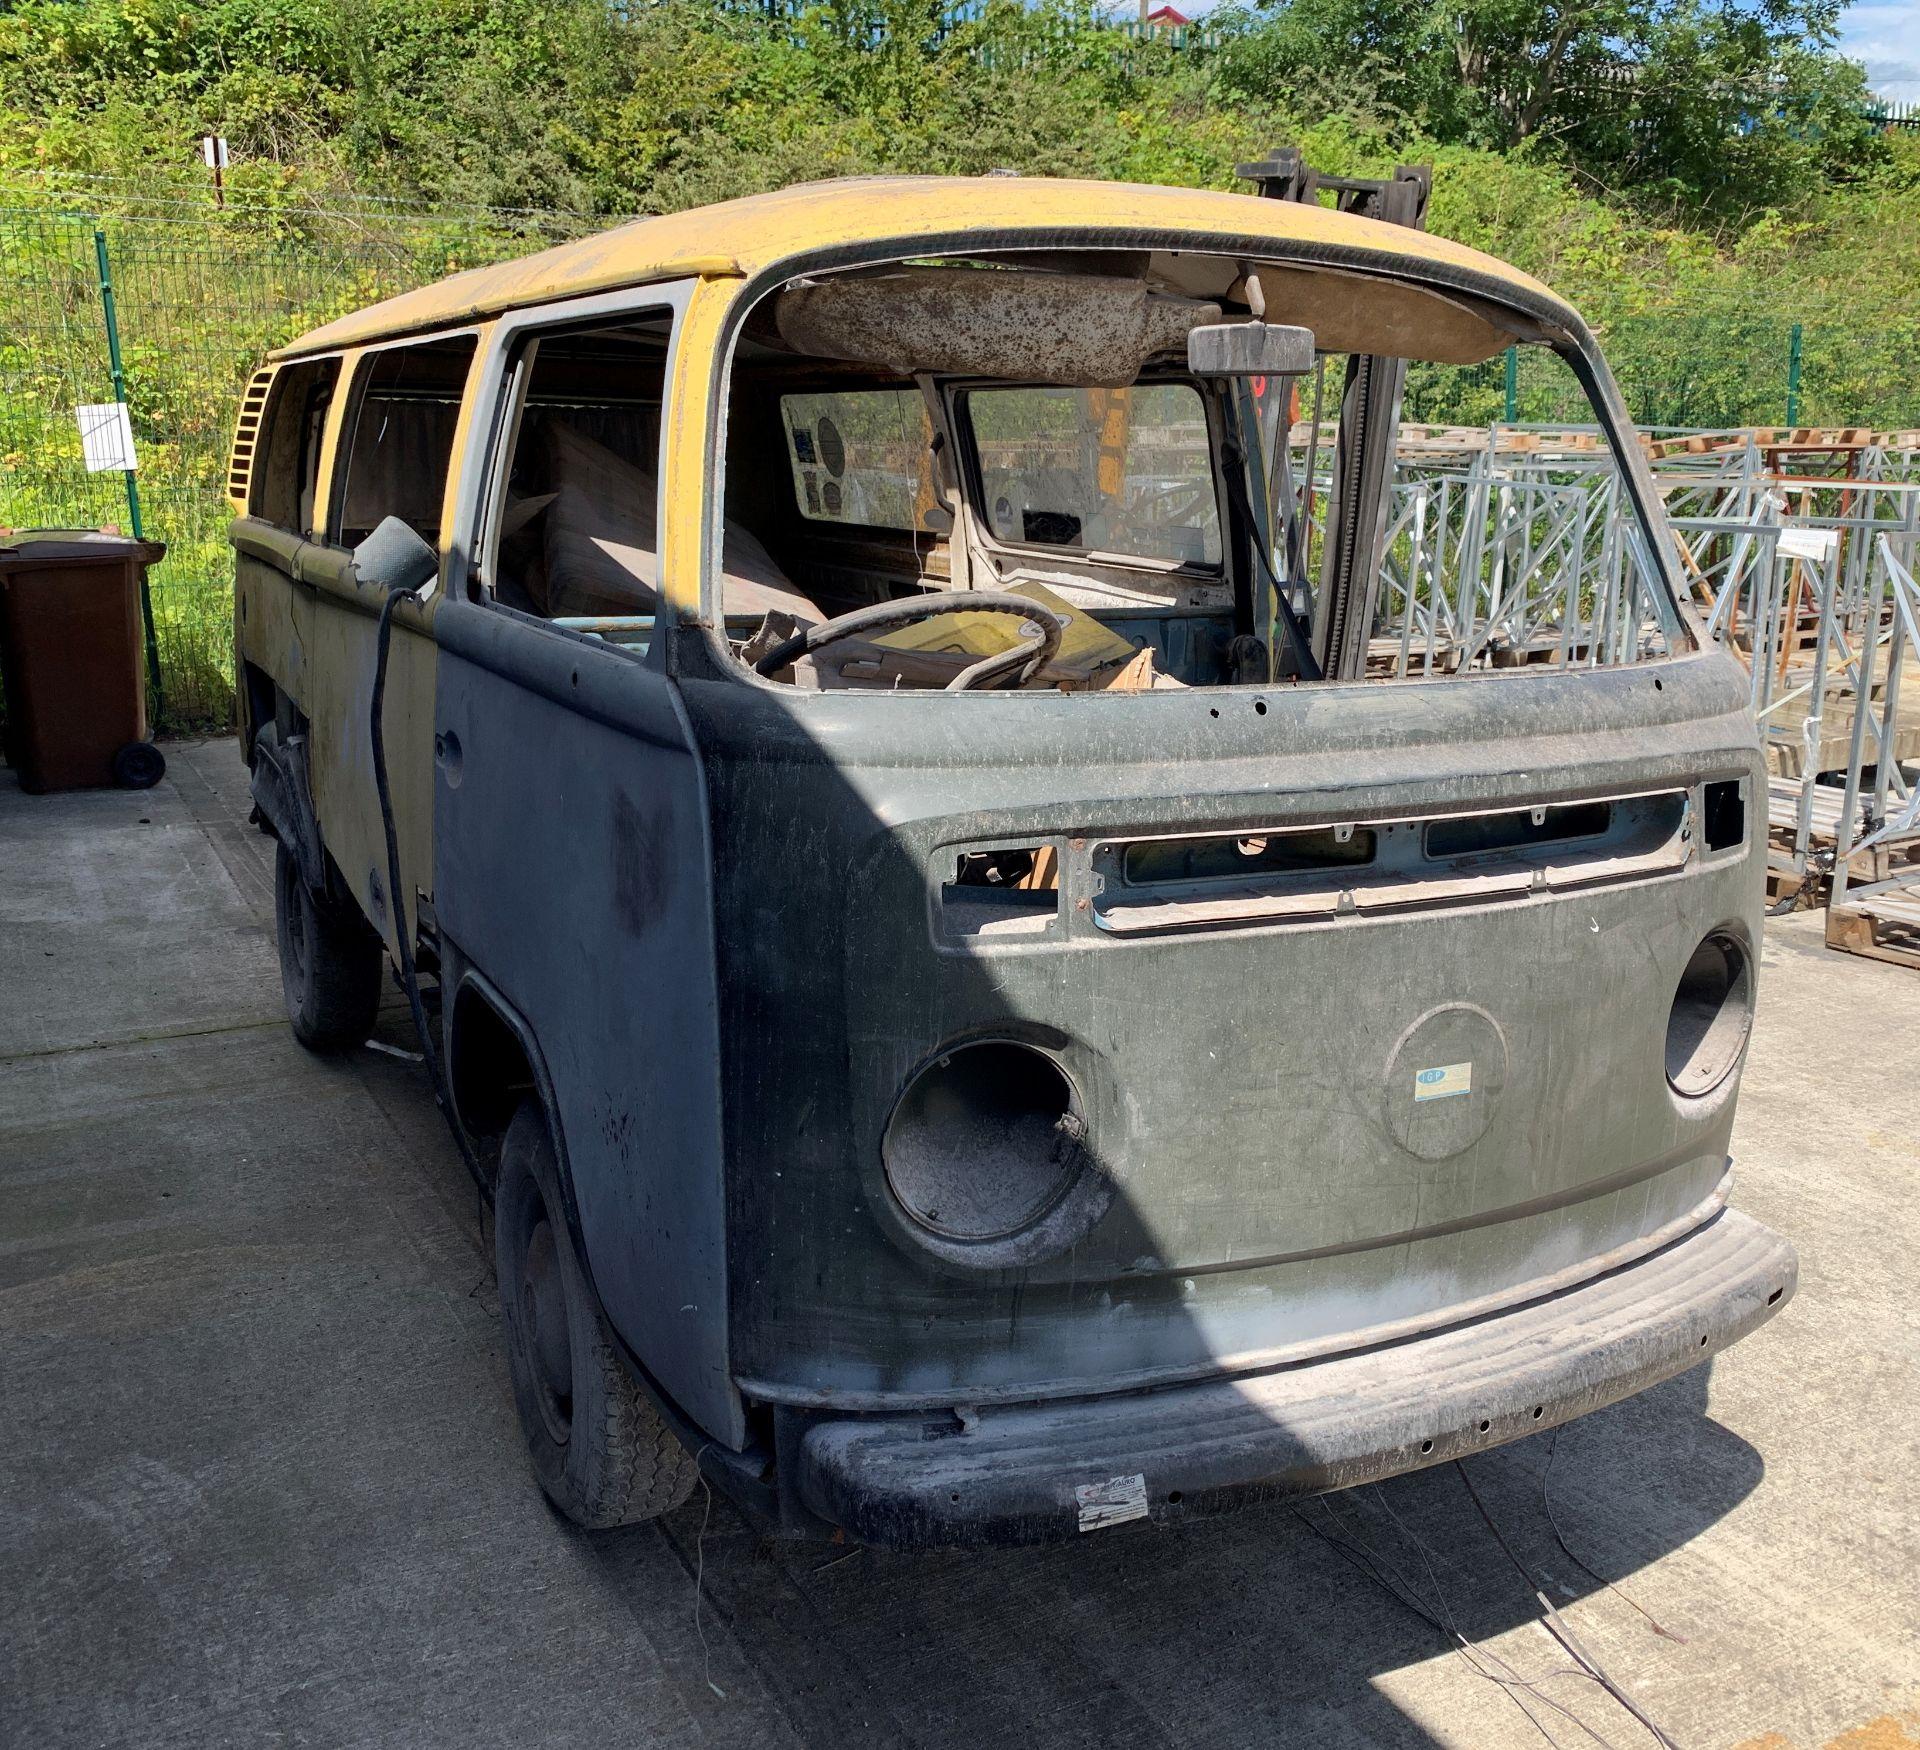 Lot 7 - RESTORATION PROJECT: VW MOTOR CARAVAN 1584cc CONVERSION (ORIGINALLY REGISTERED AS A VW DELIVERY